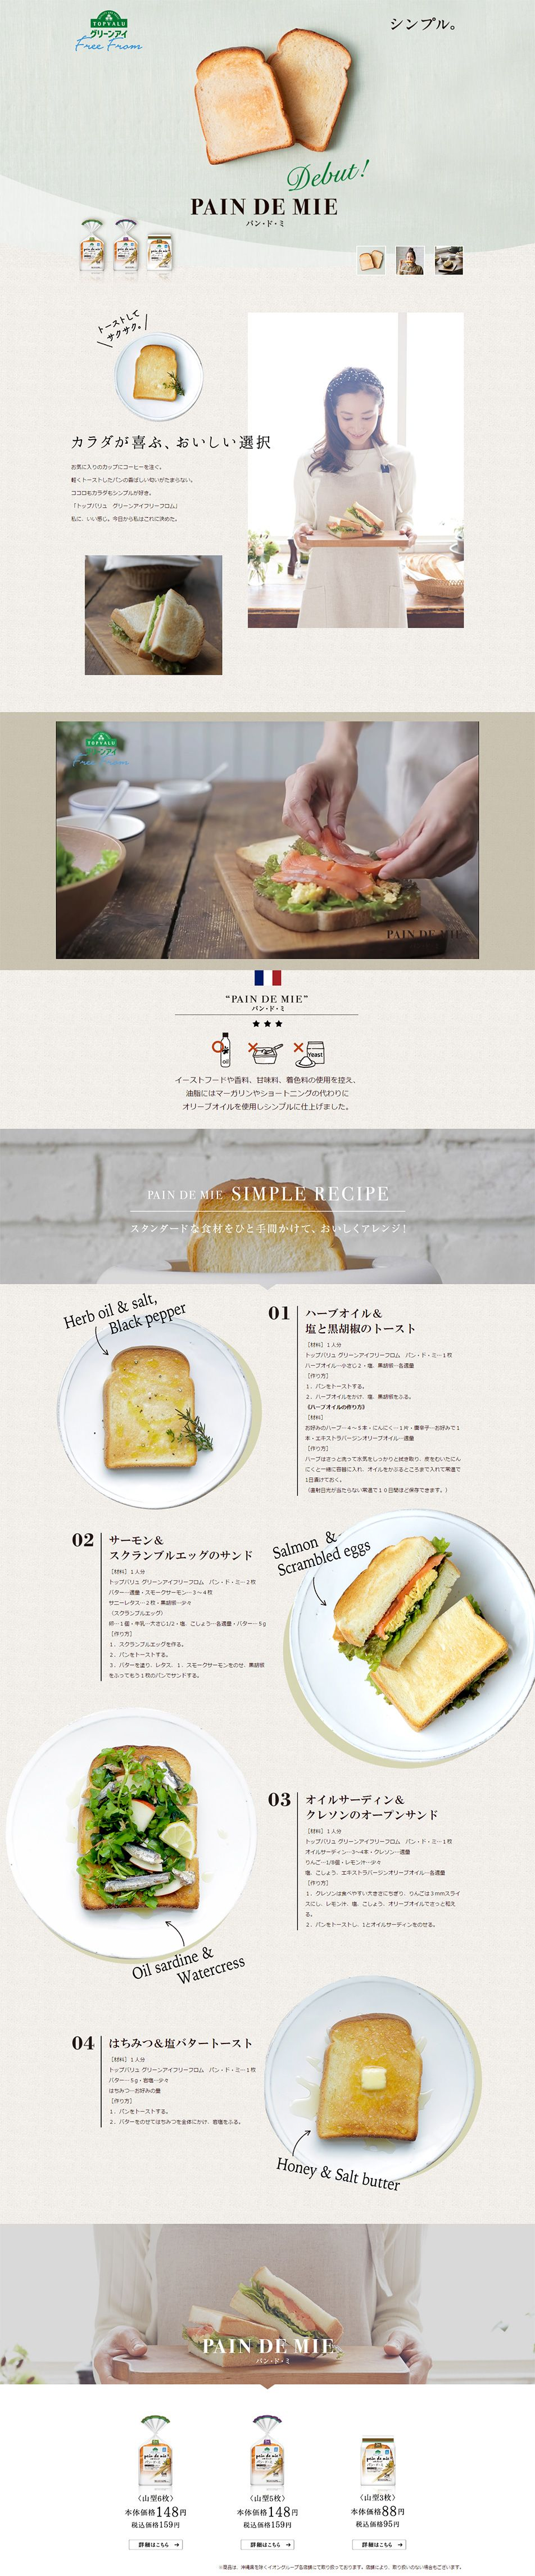 PAIN DE MIE【食品関連】のLPデザイン。WEBデザイナーさん必見!ランディングページのデザイン参考に(シンプル系)